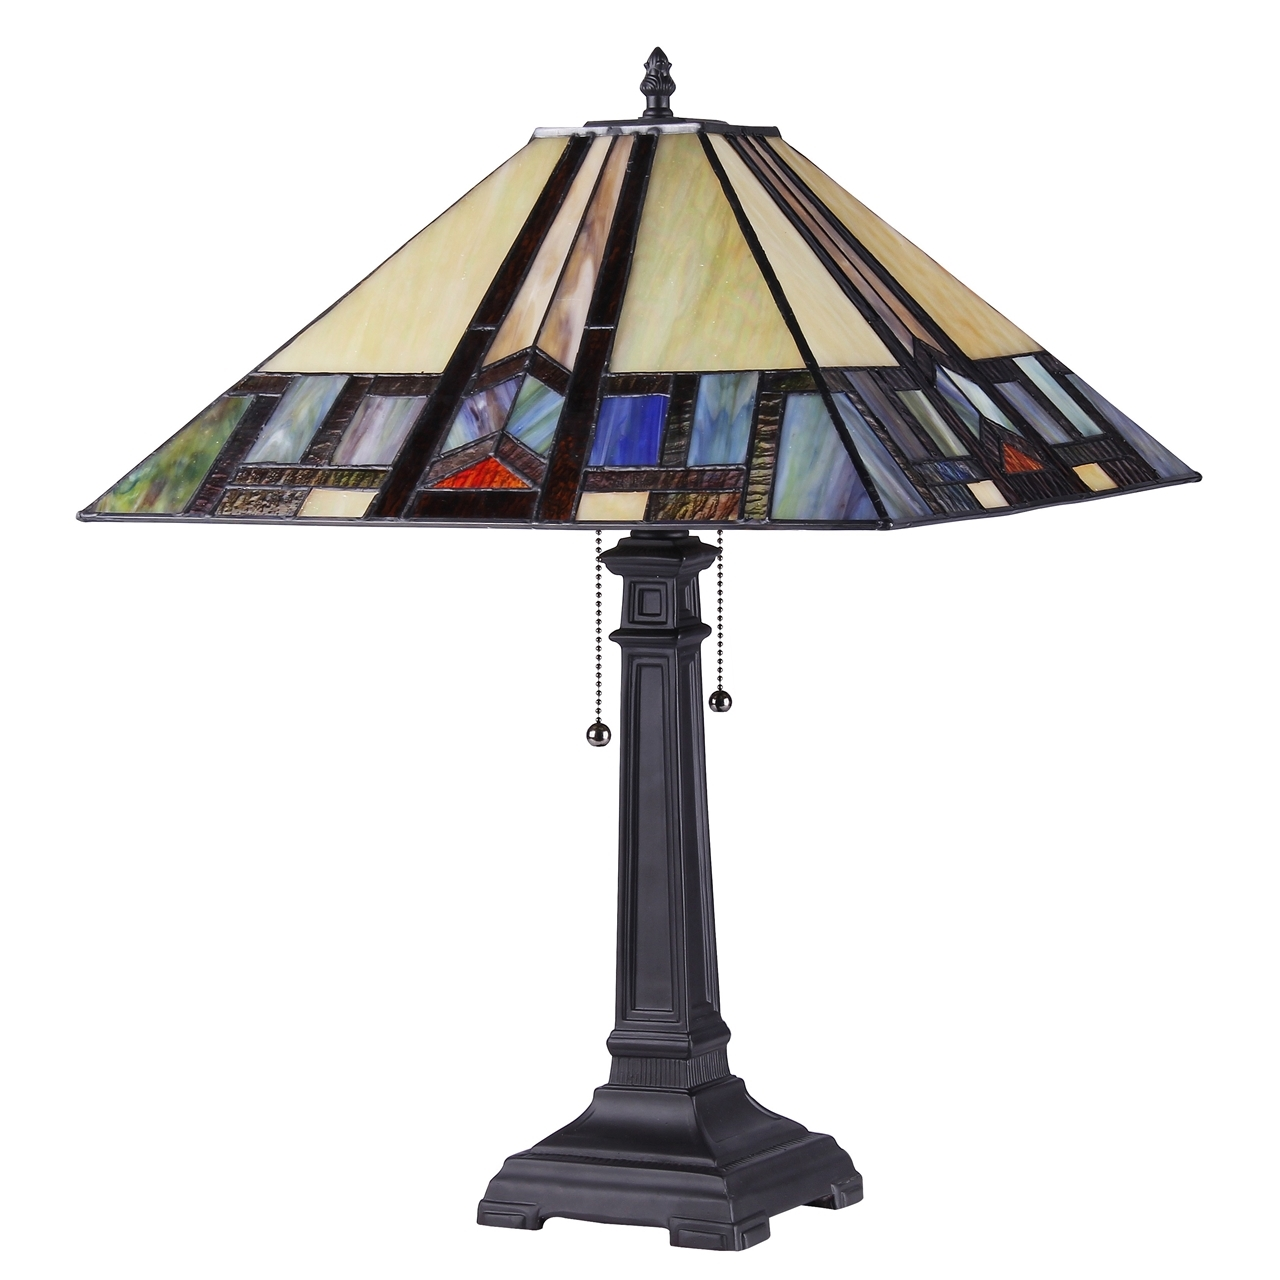 CHLOE Lighting, Inc Tiffany Lamp, Tiffany Lamps, Tiffany ...